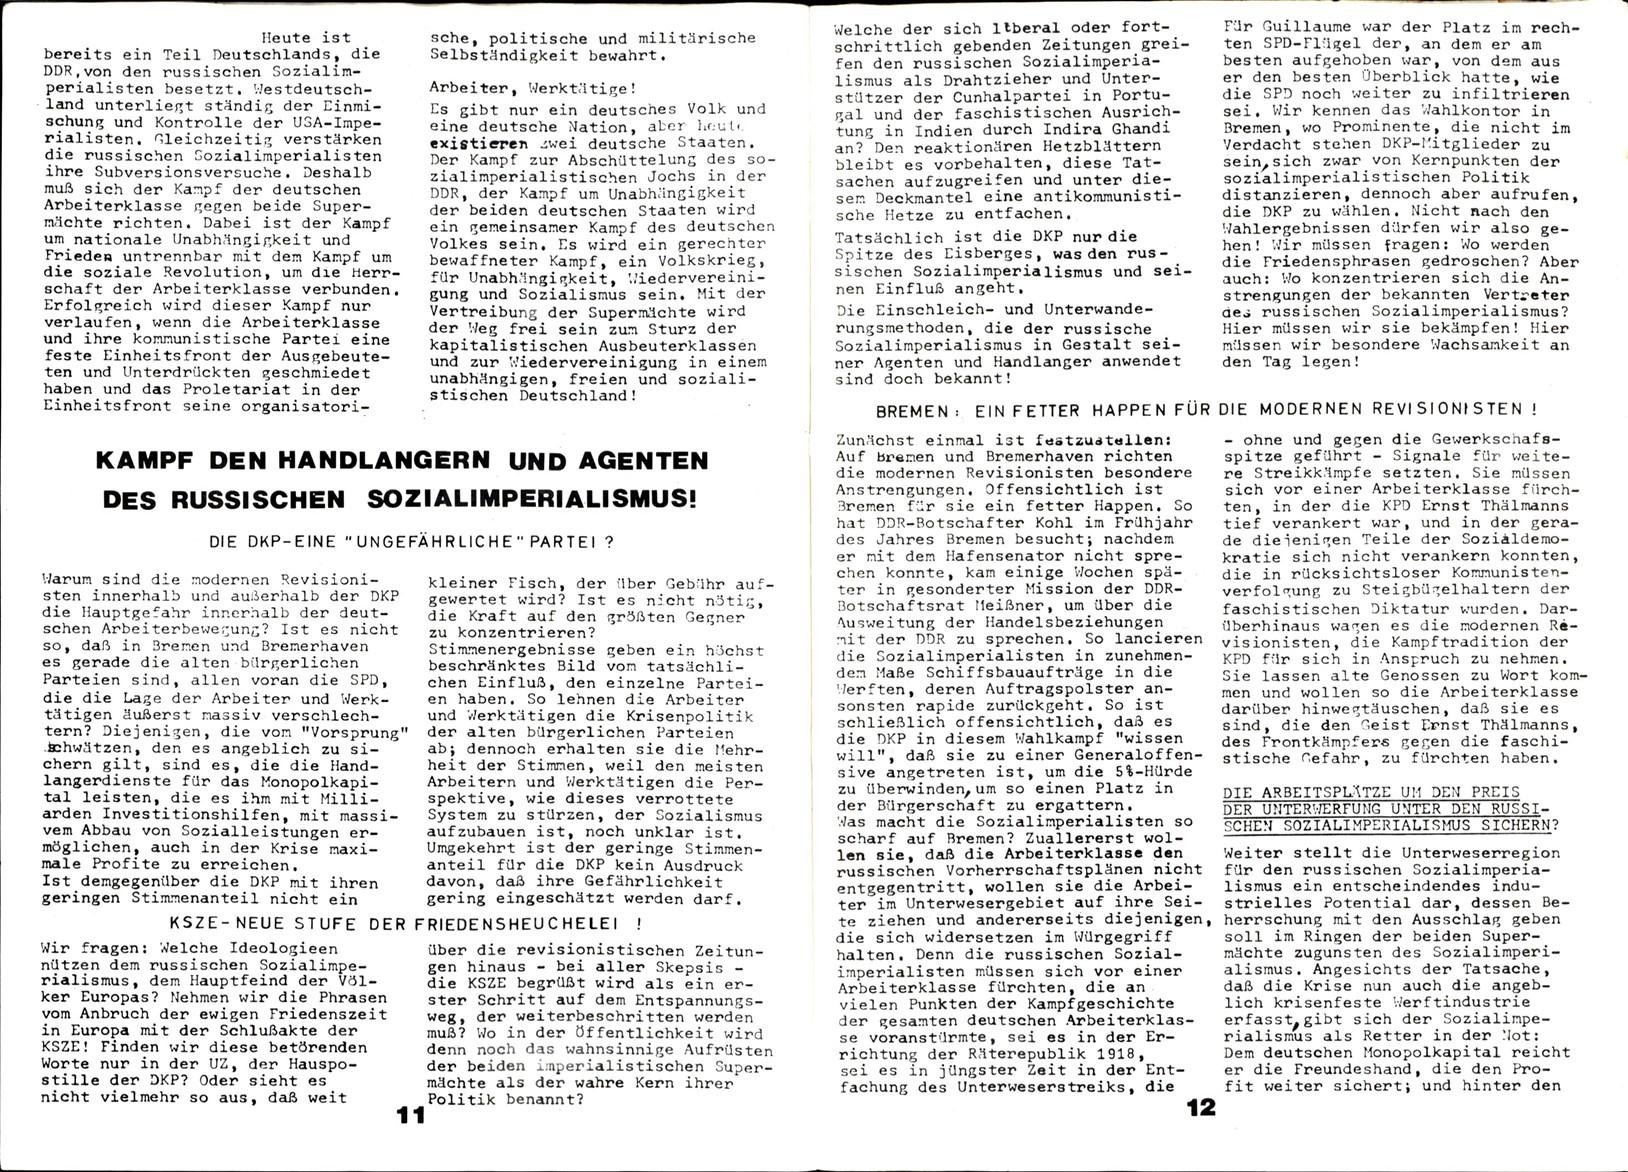 Bremen_KPDAO_1975_Buergerschaftswahl_07